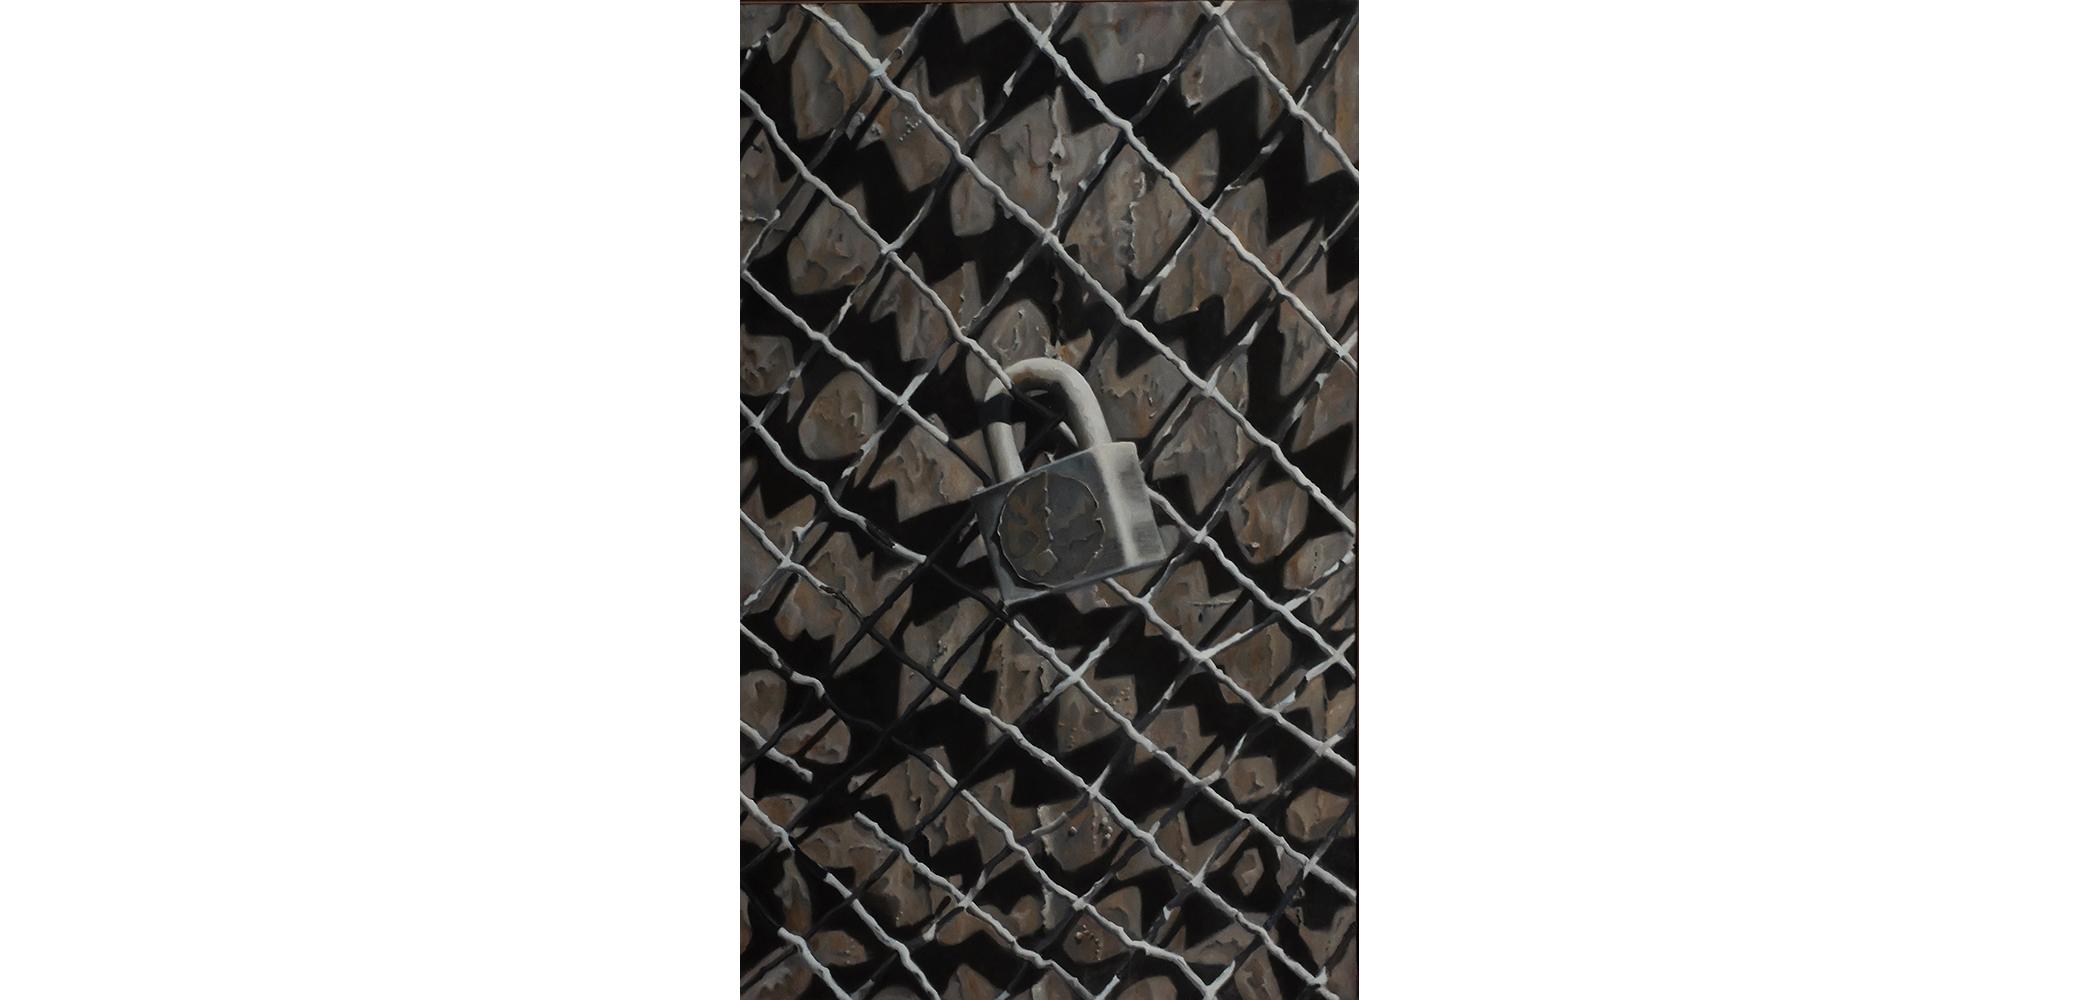 ScottGeyer_Lock on Fence_48x30_$3750.jpg